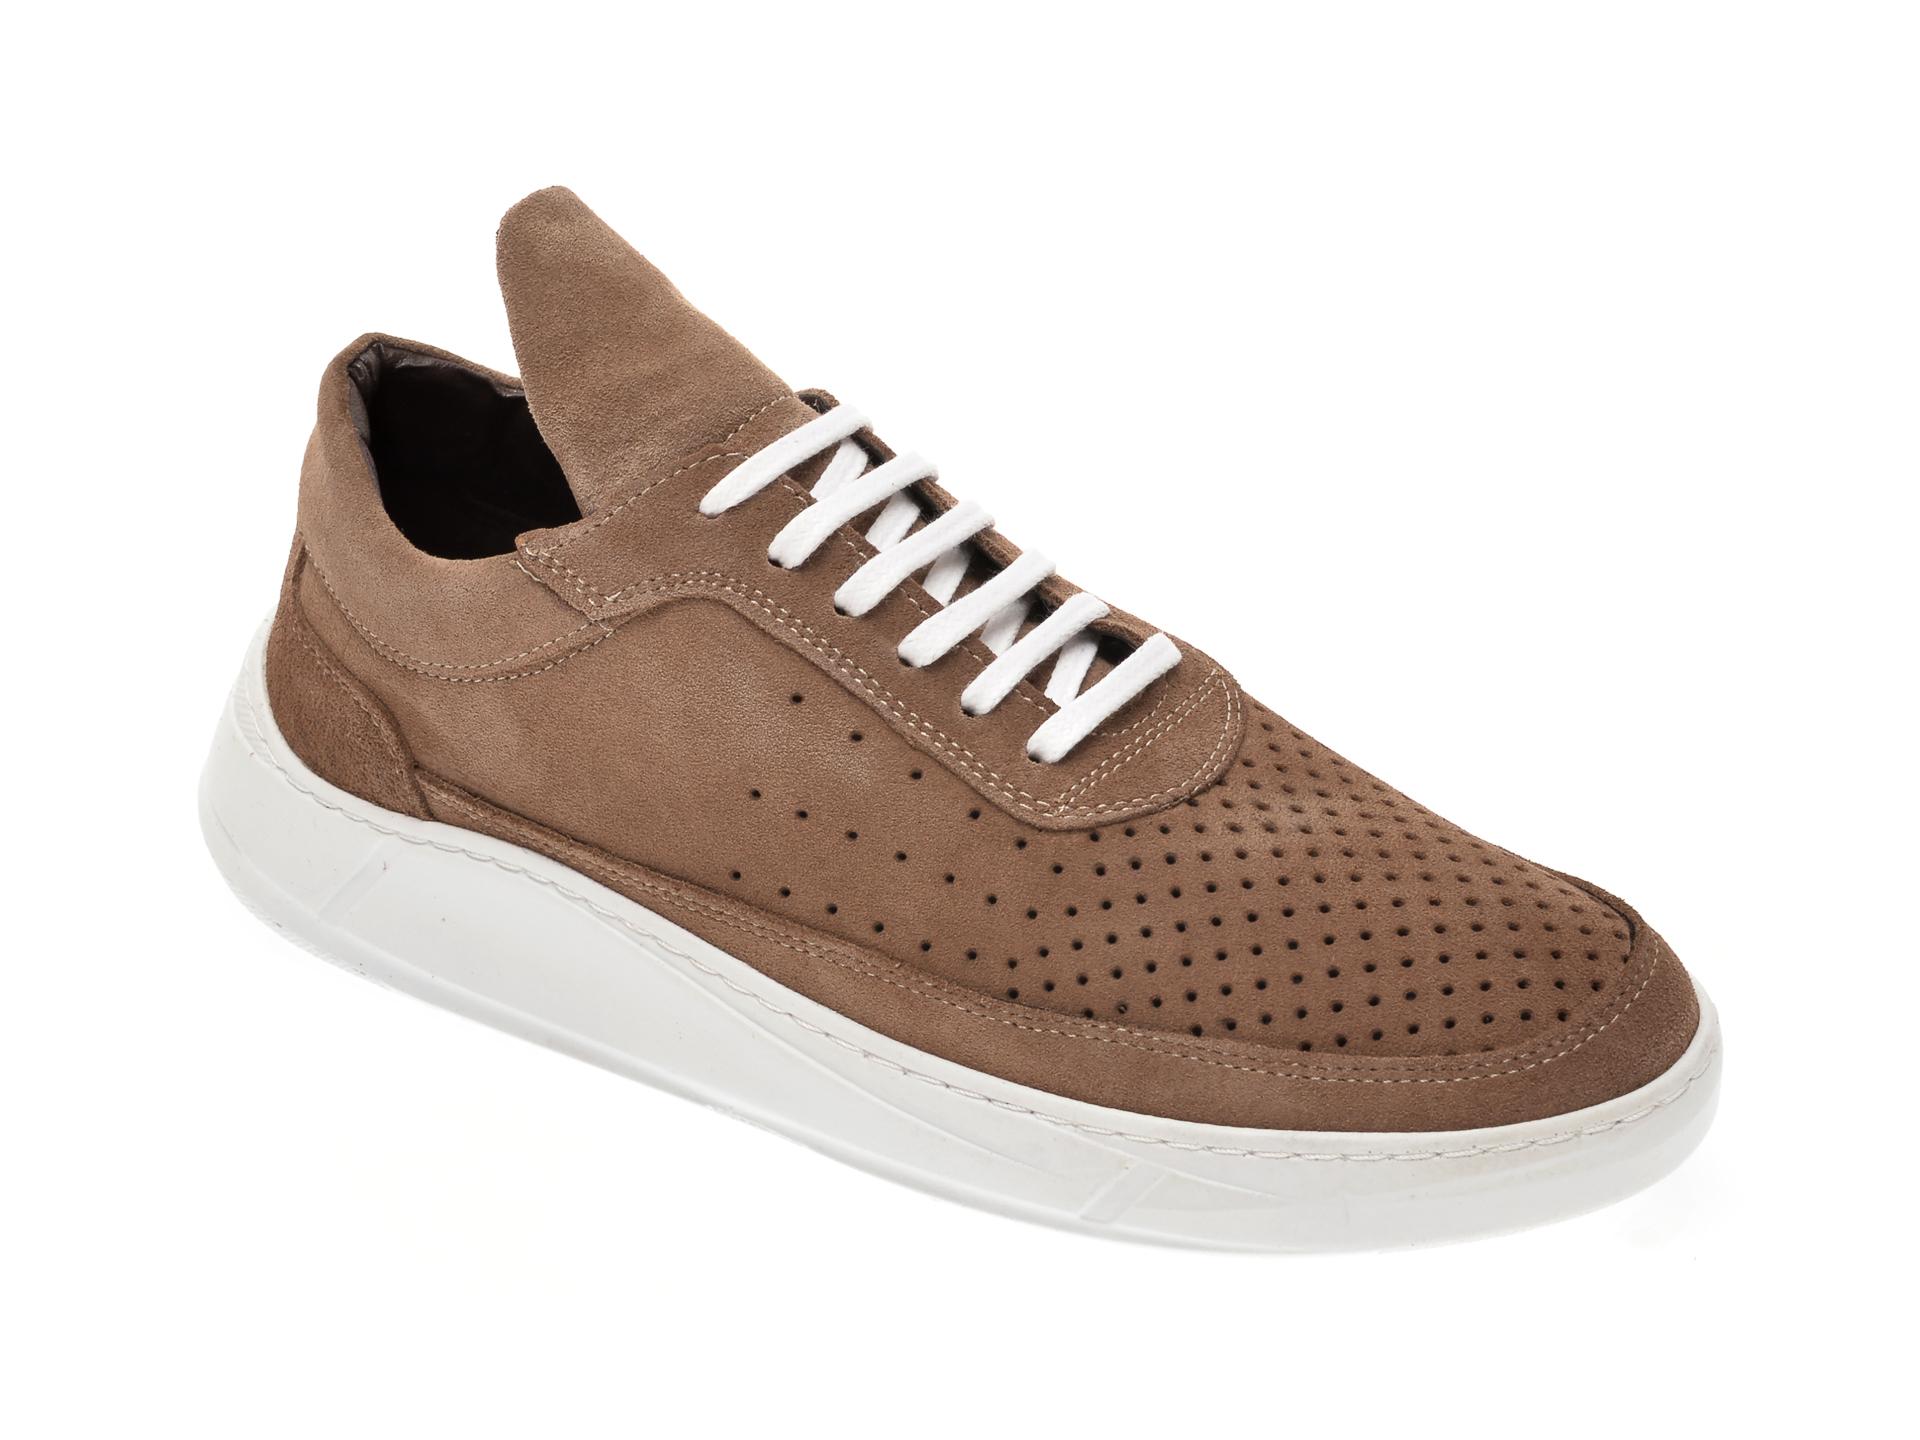 Pantofi OTTER gri, M1715, din piele intoarsa imagine